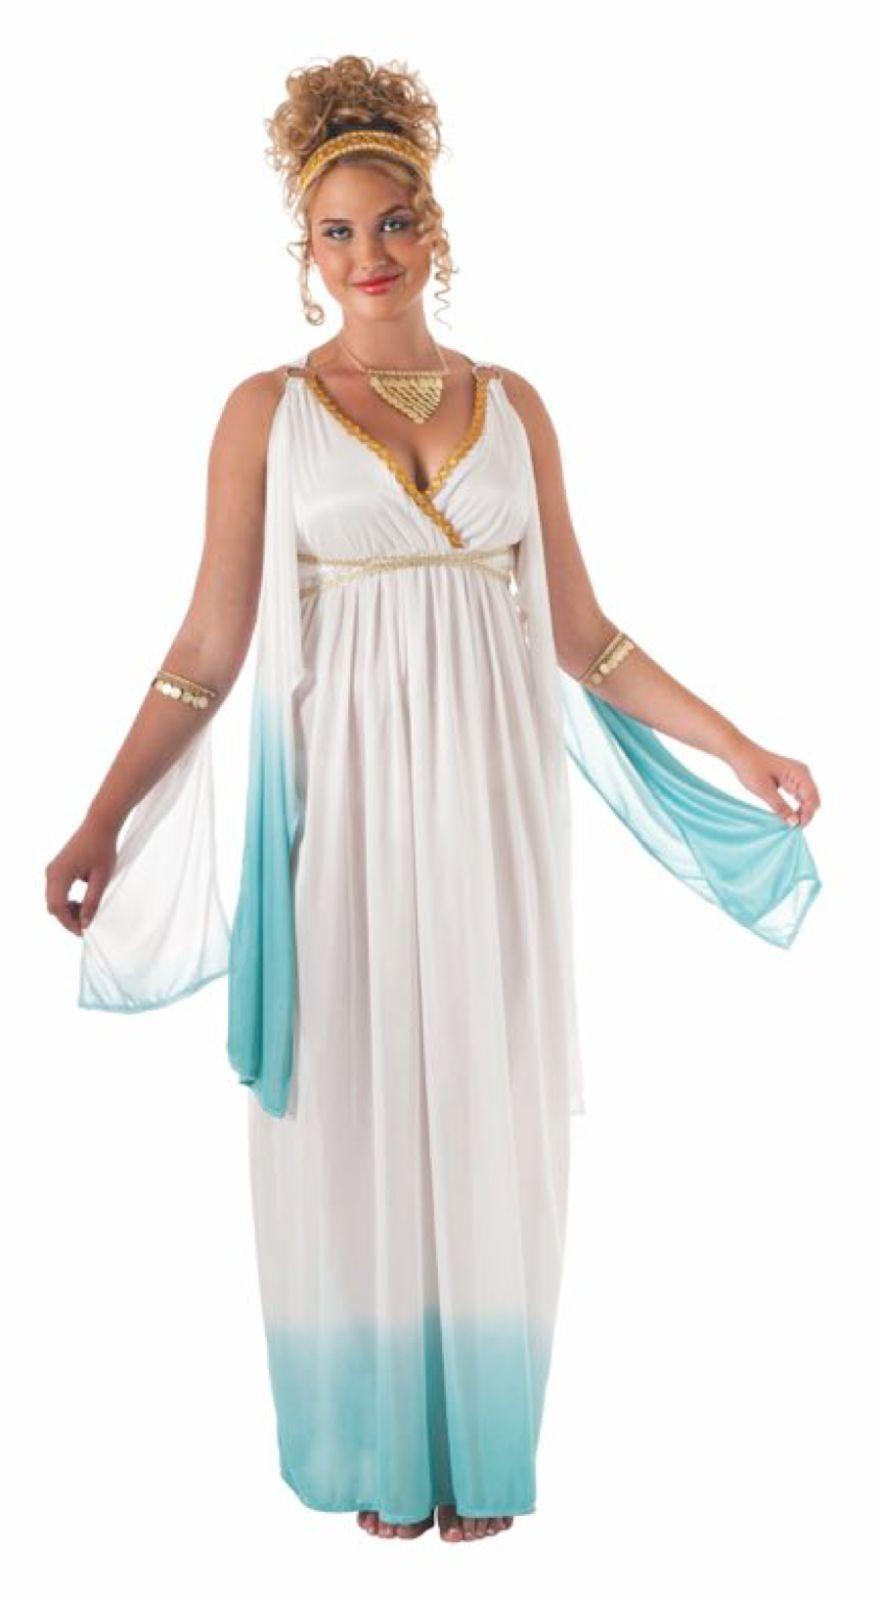 Image 1 of White Grecian Goddess Plus Size Ladies Adult Costume, Rubies 17785